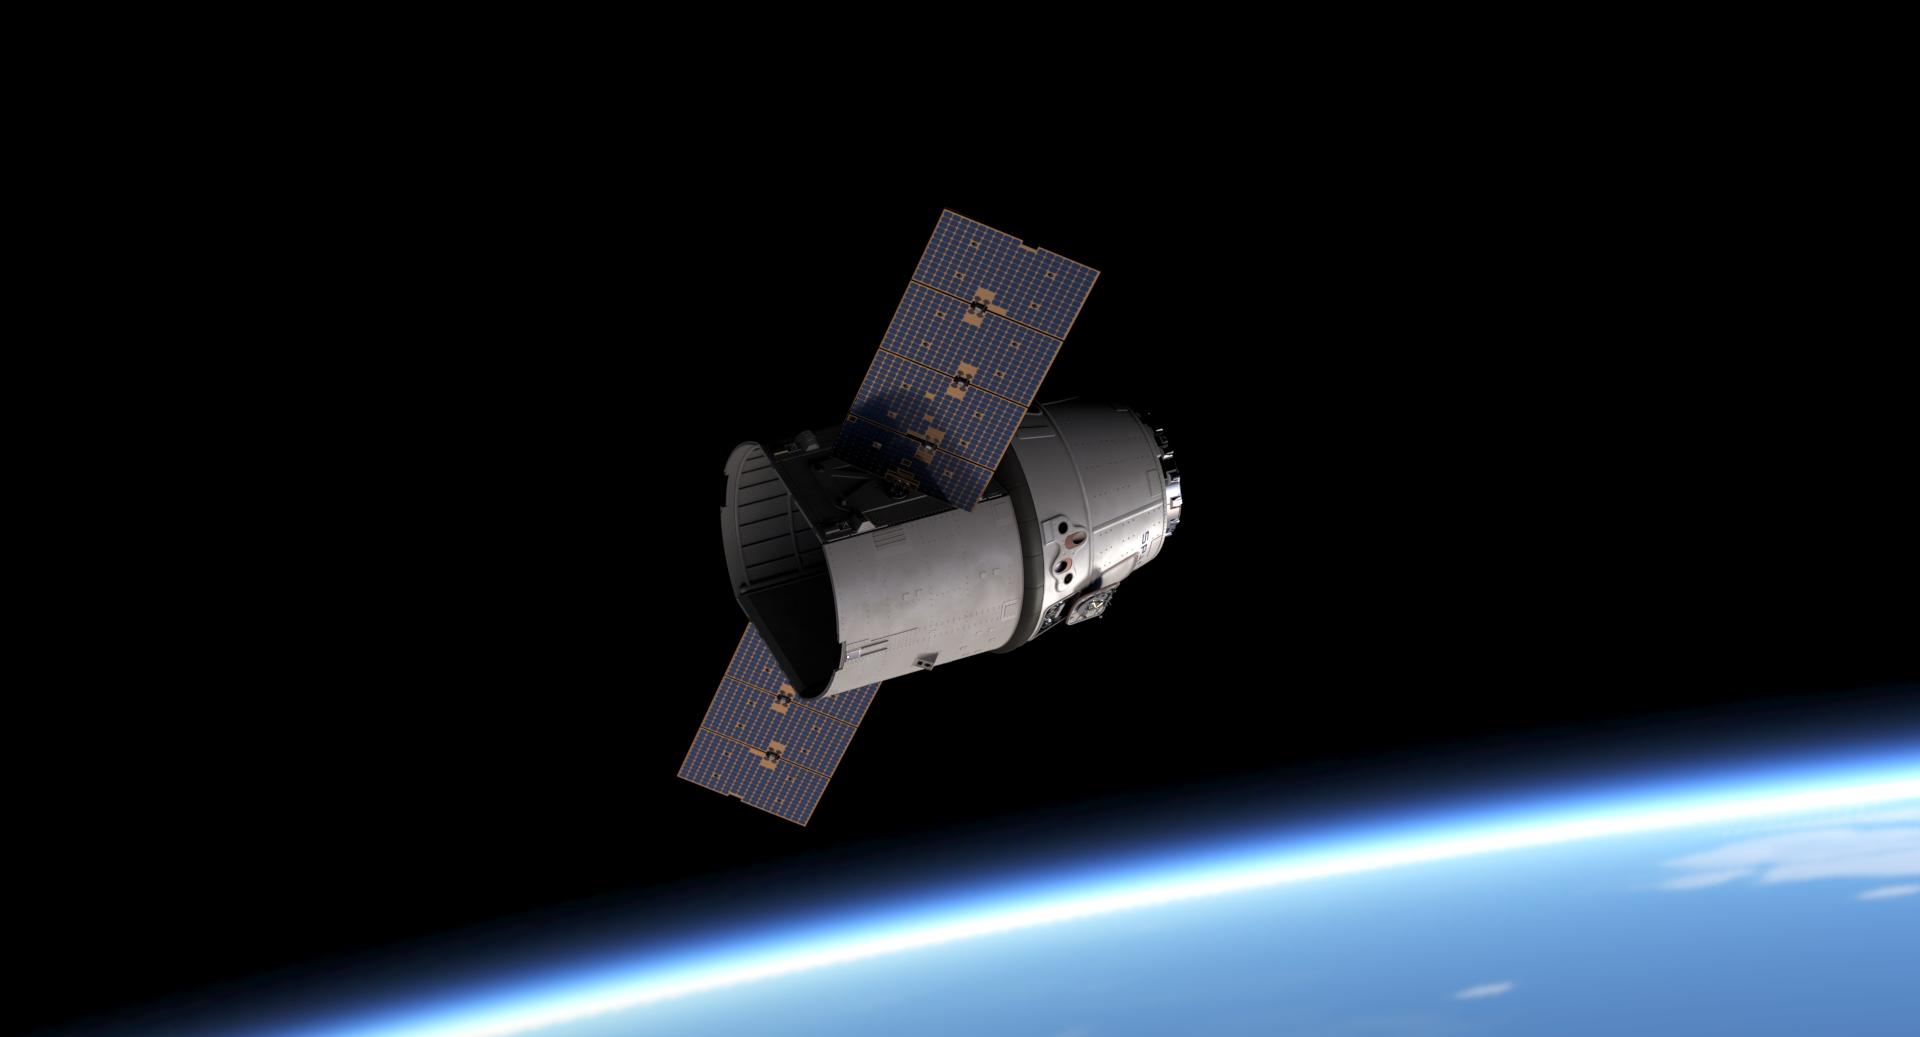 Cargo Dragon in orbit (Reese Wilson)